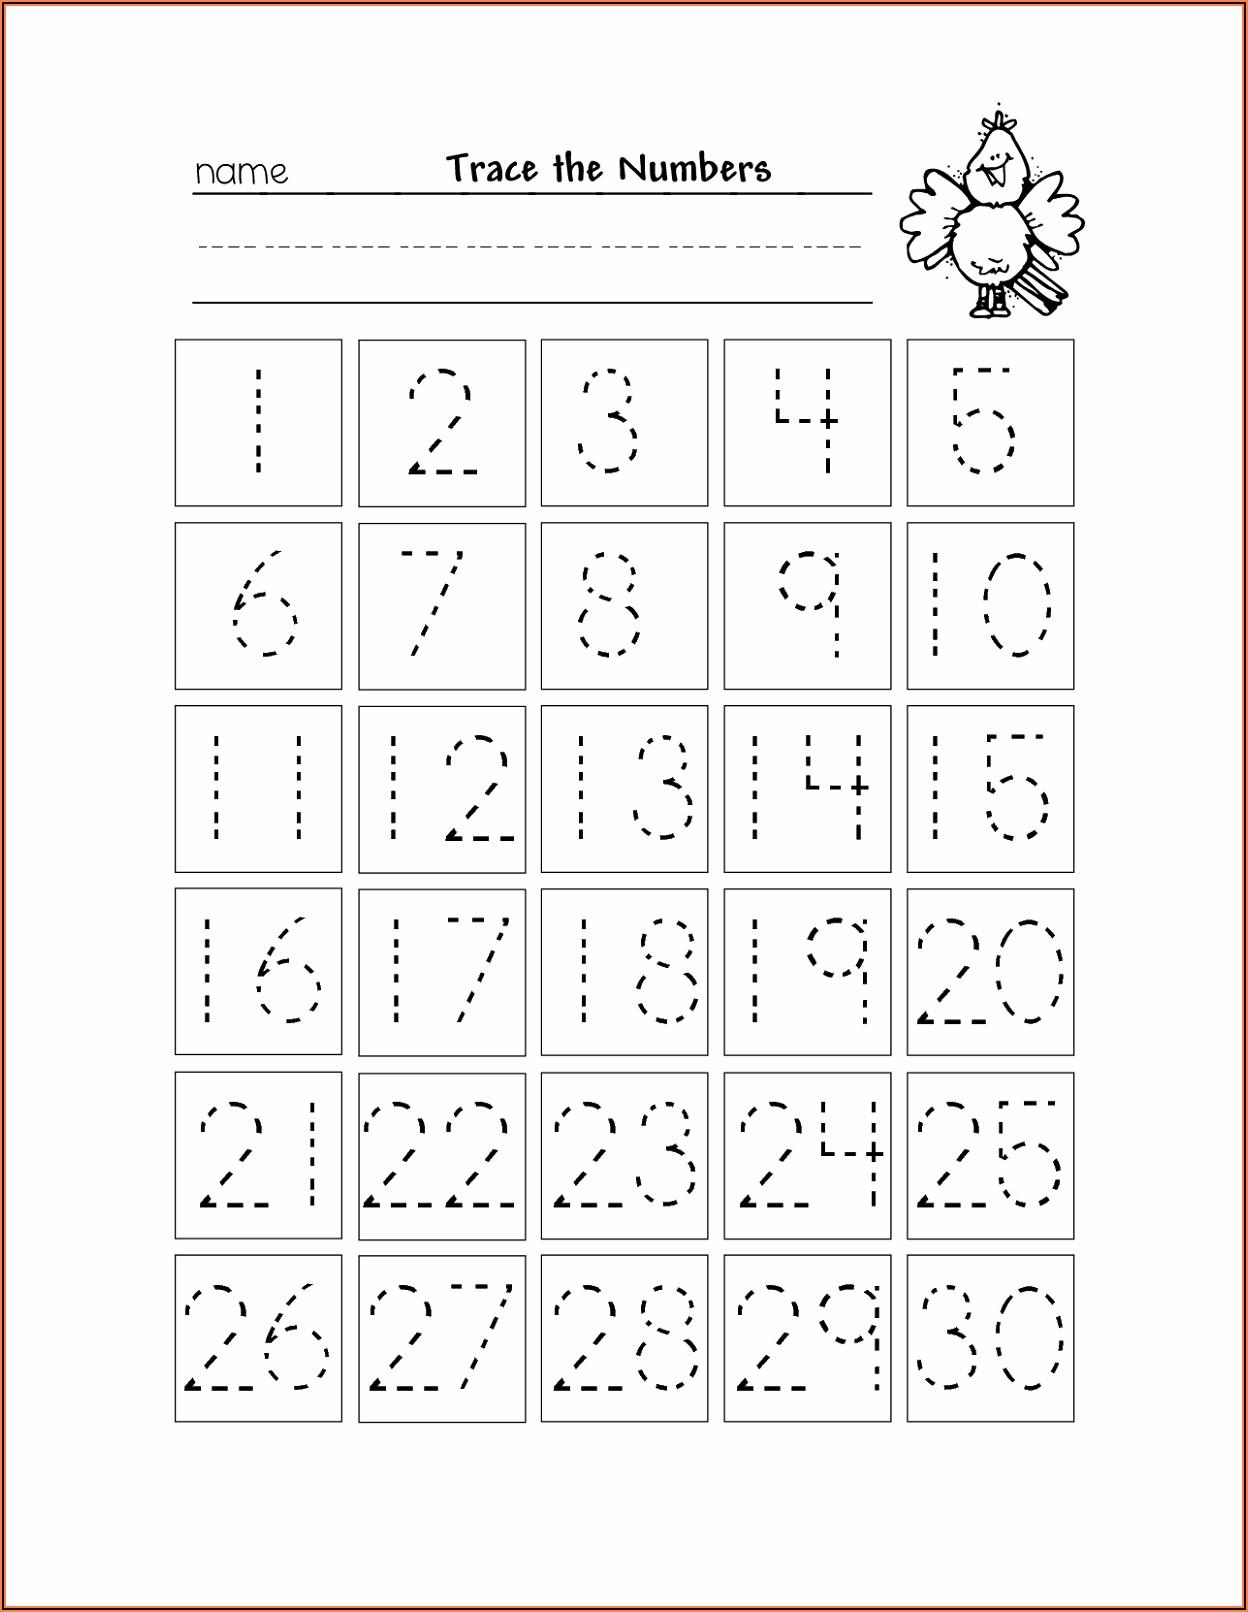 Number Tracing Worksheets 11 20 Pdf